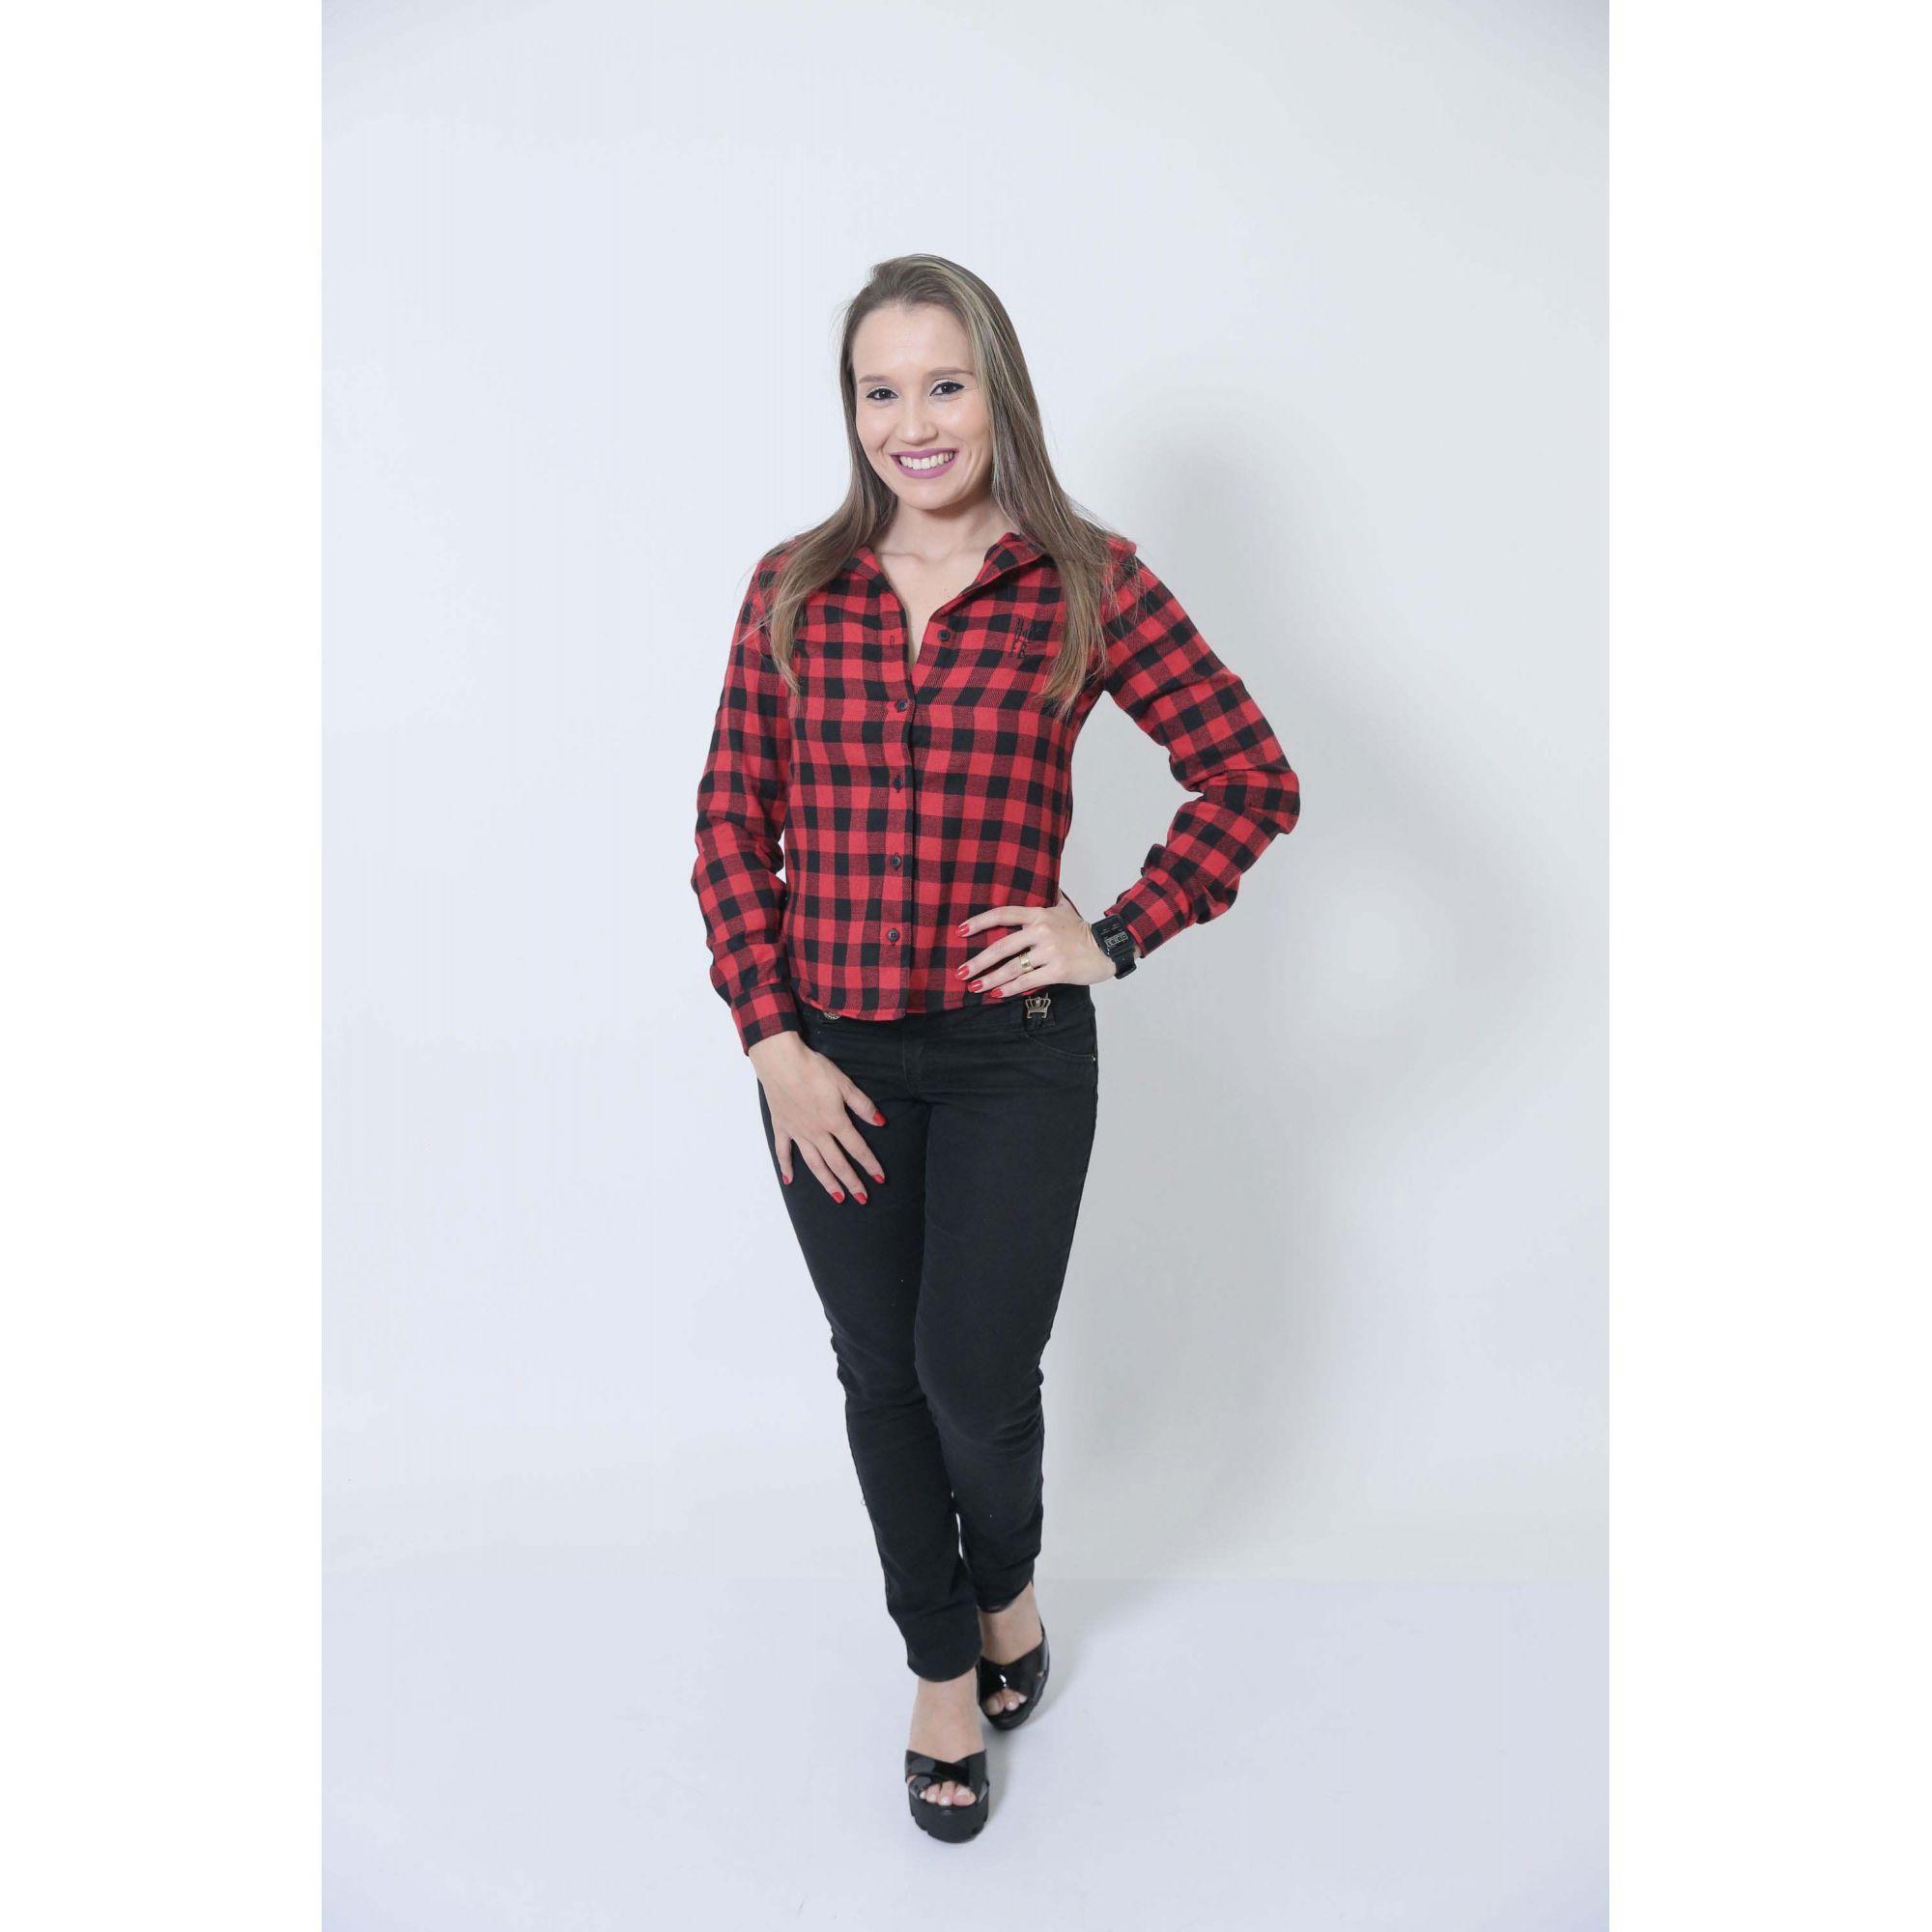 Camisa Social Xadrez Flanelada Lenhador Feminina  - Heitor Fashion Brazil